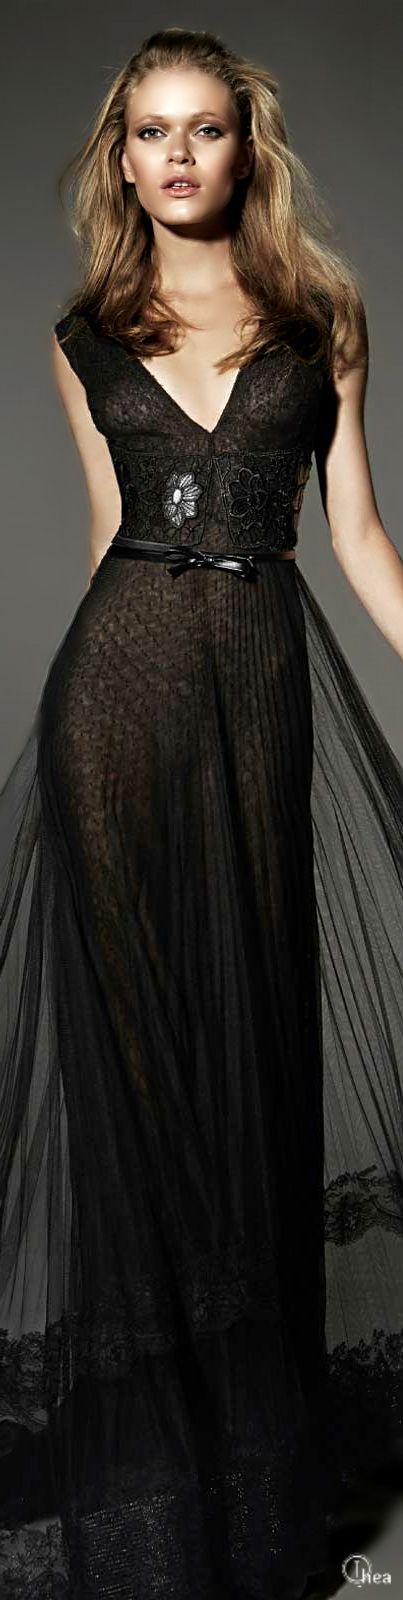 Yolan Cris AW 2015 | Keep The Glamour ♡ ✤ LadyLuxury ✤ black sheer evening dress. www.misskrizia.com